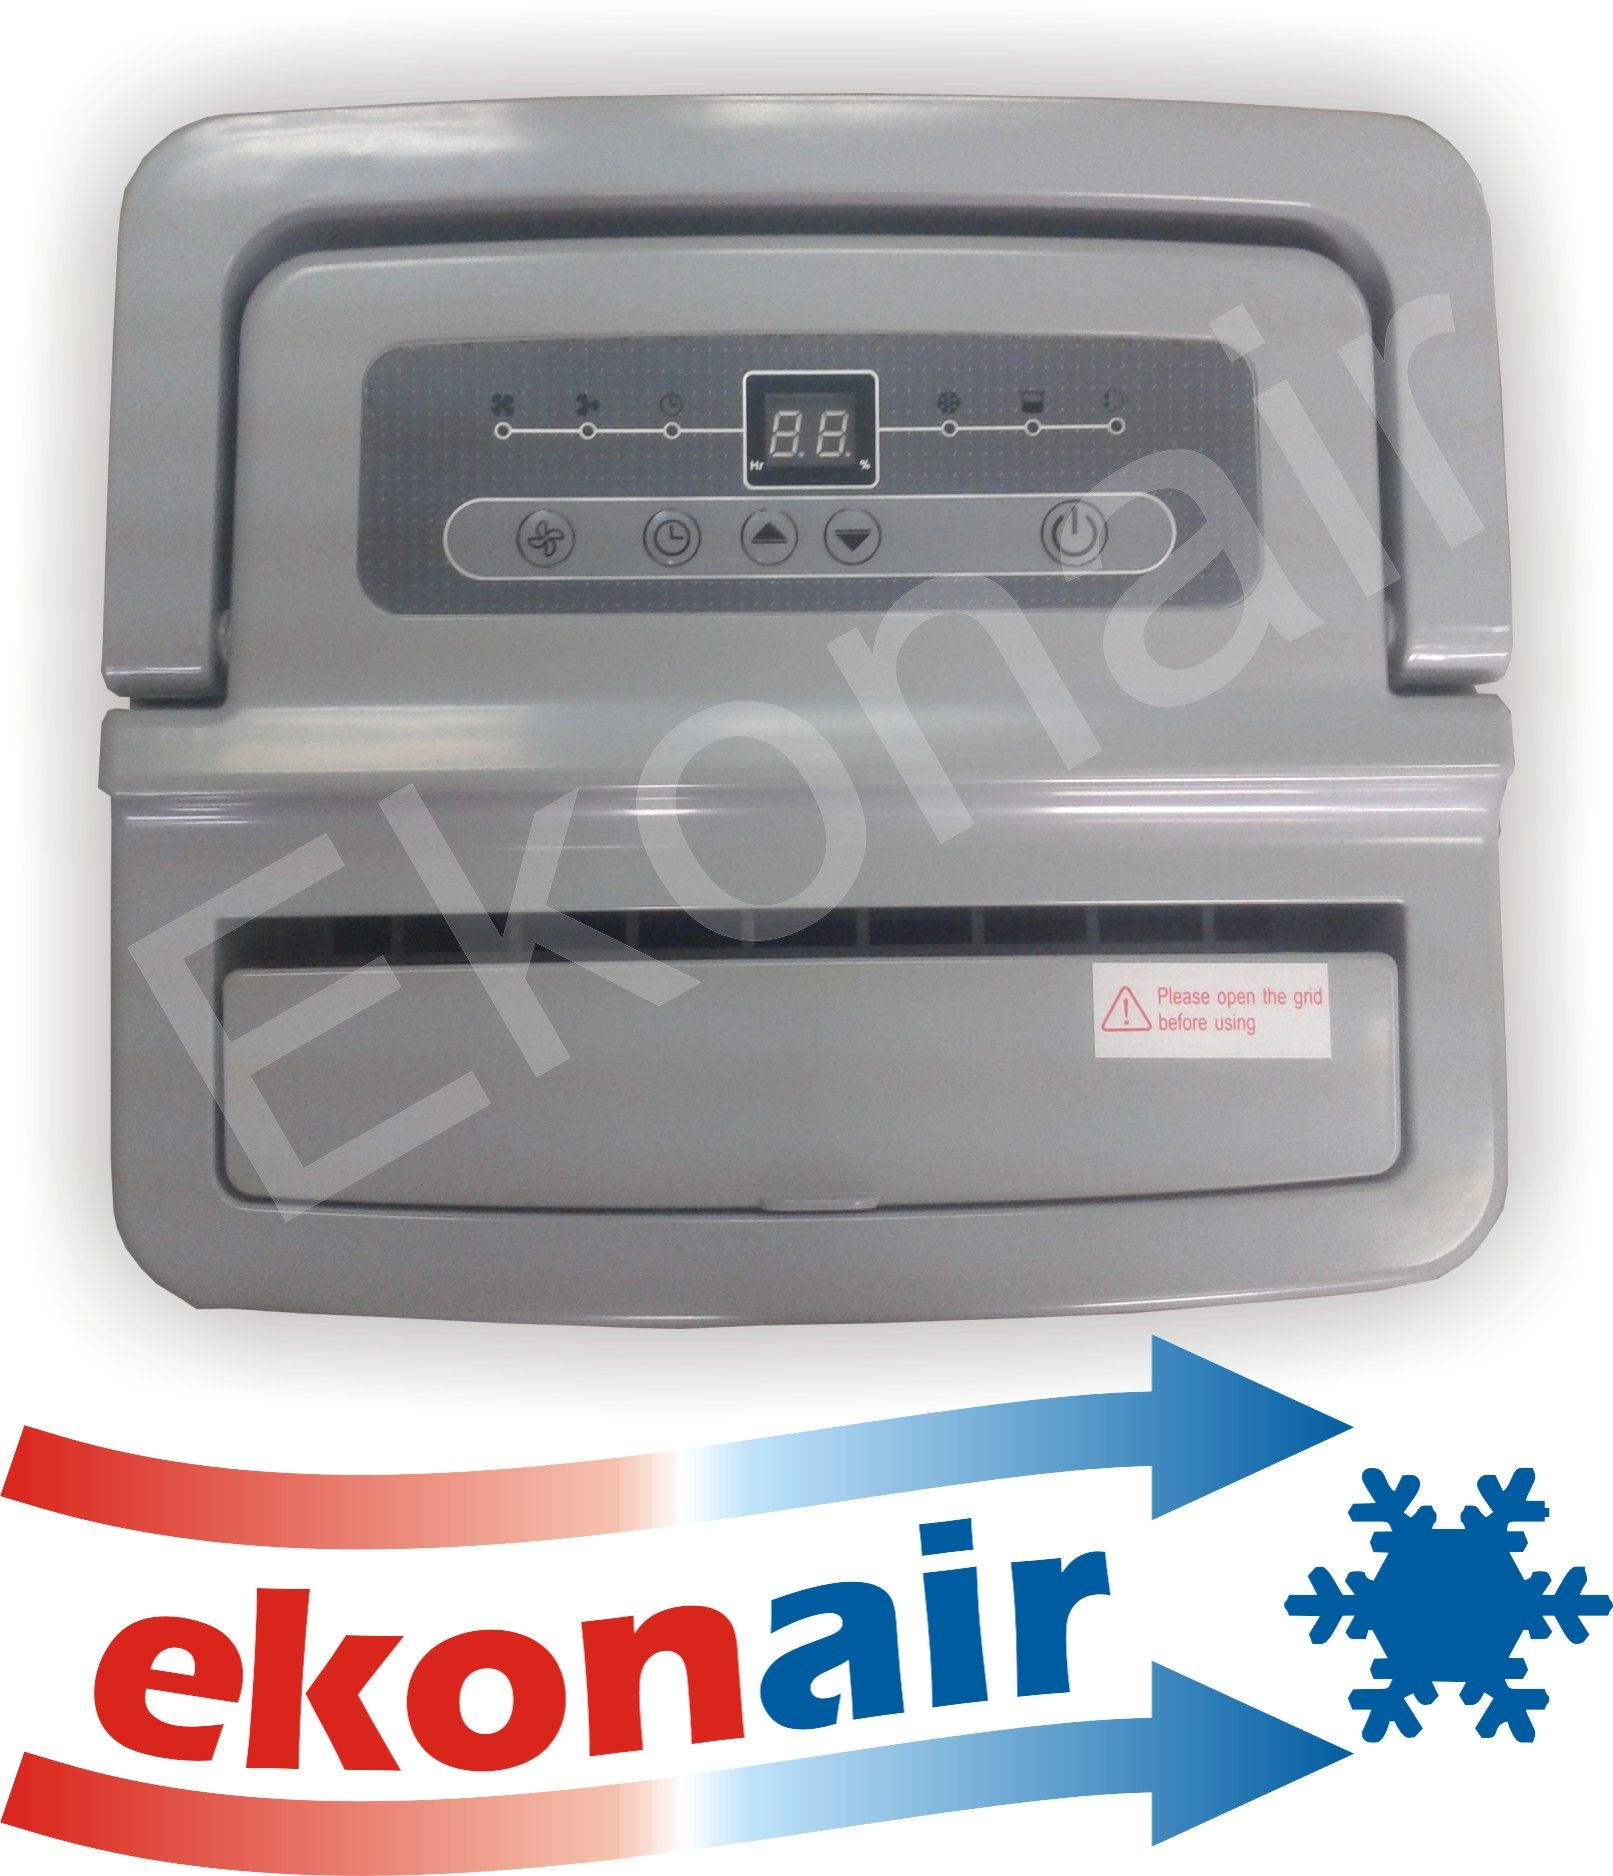 Polprofesjonalne Osuszacz Powietrza Sahara 20 Ekonair Electronic Products Electronics Walkman